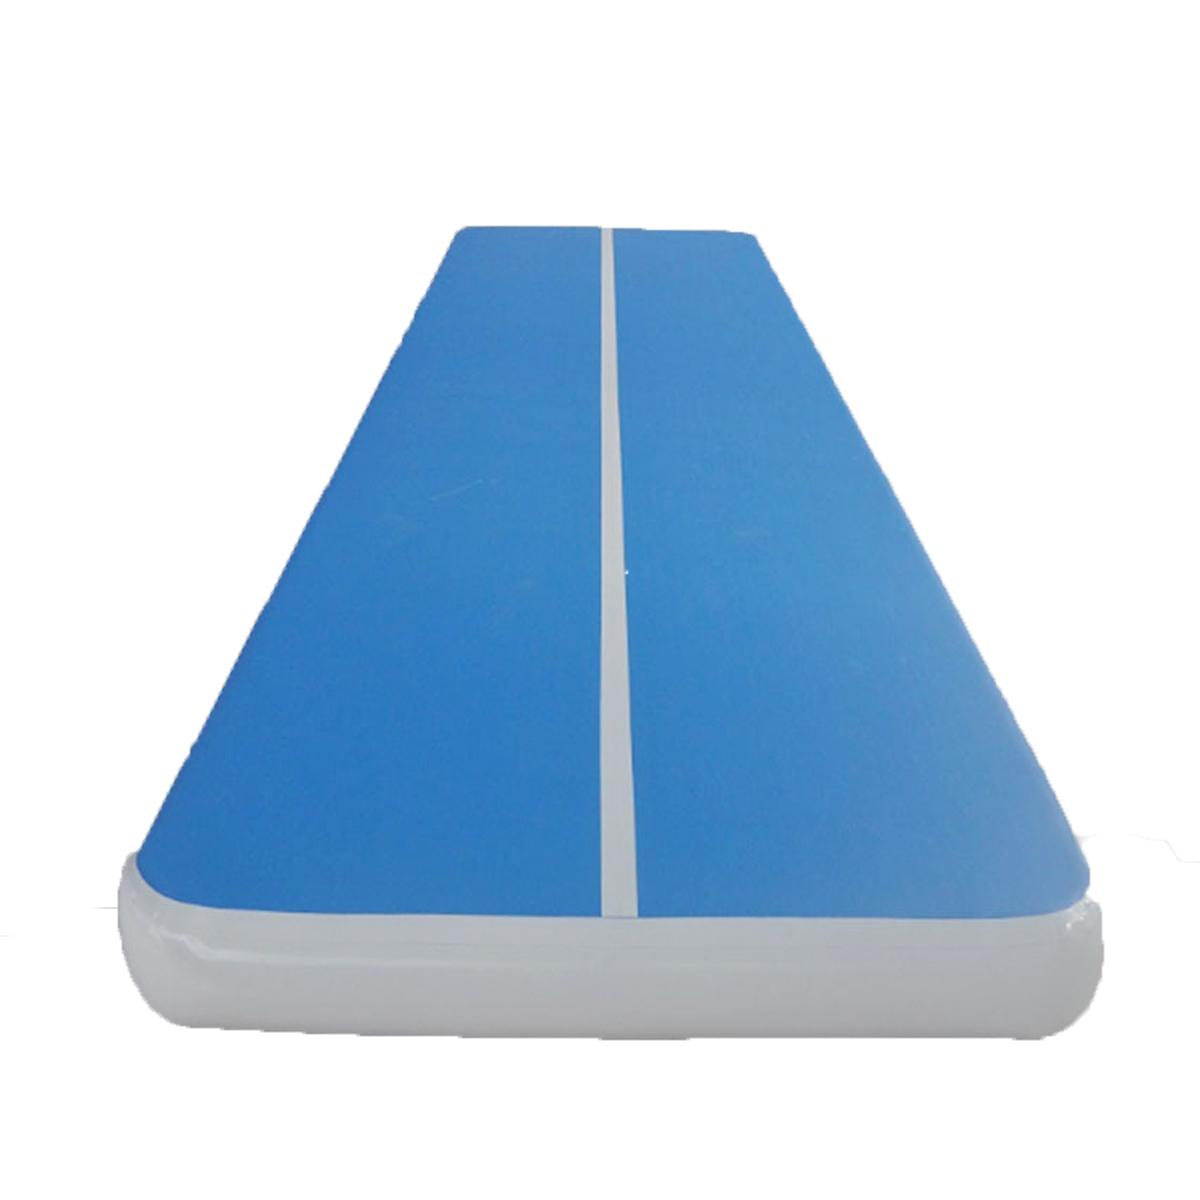 4x2m Inflatable Gym Mat Air Tumbling Track Gymnastics